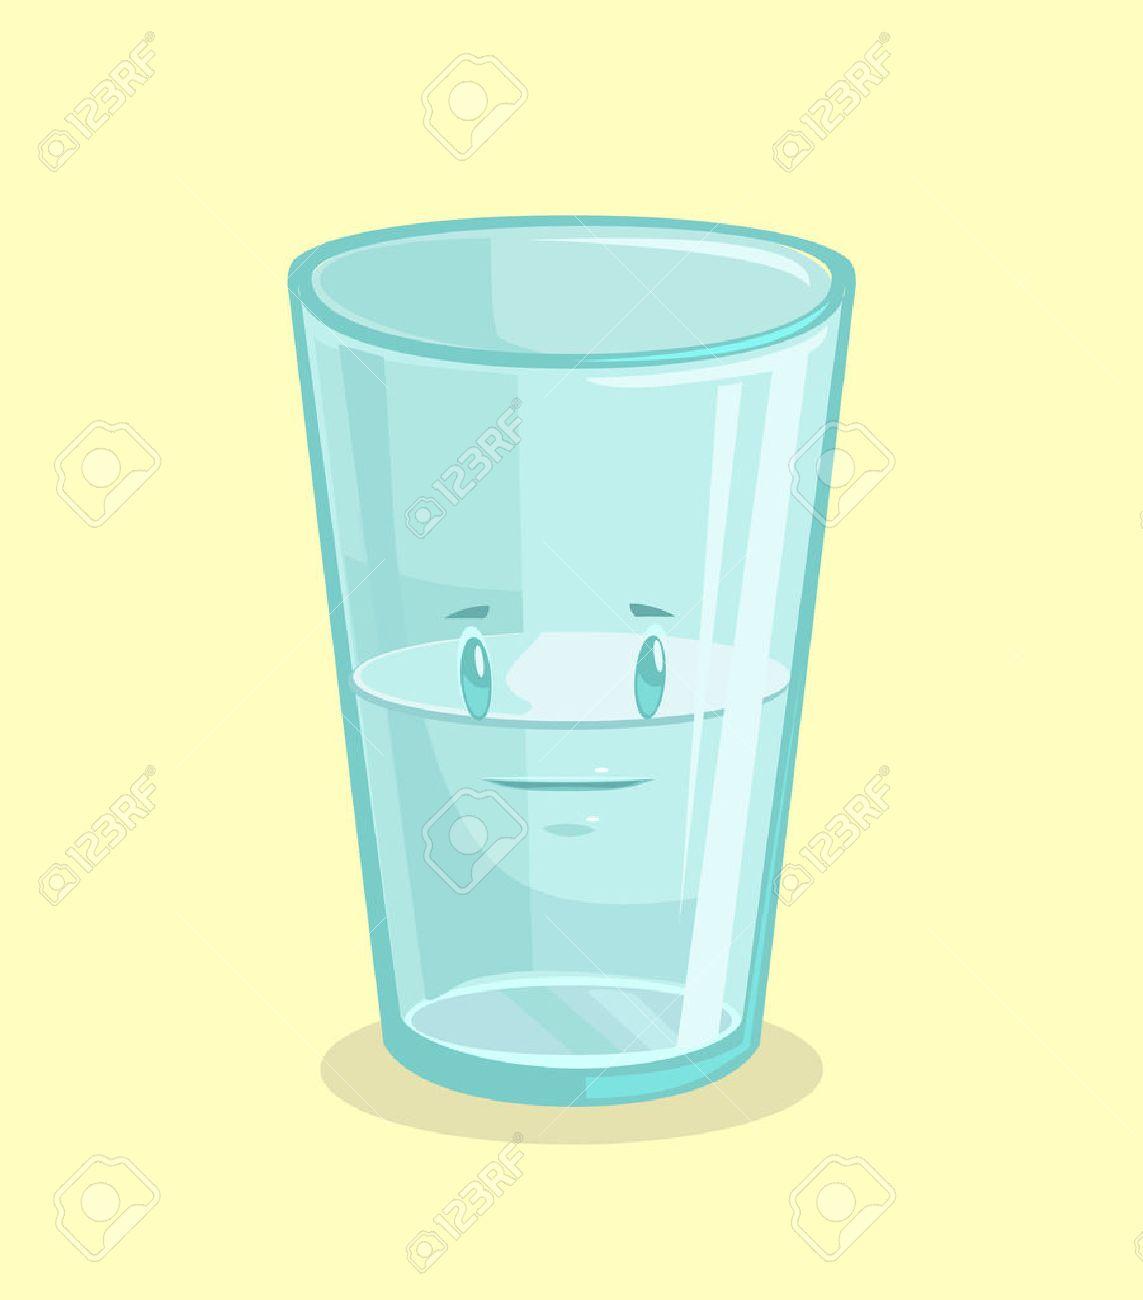 Half full glass of water. Vector flat cartoon illustration - 59015895